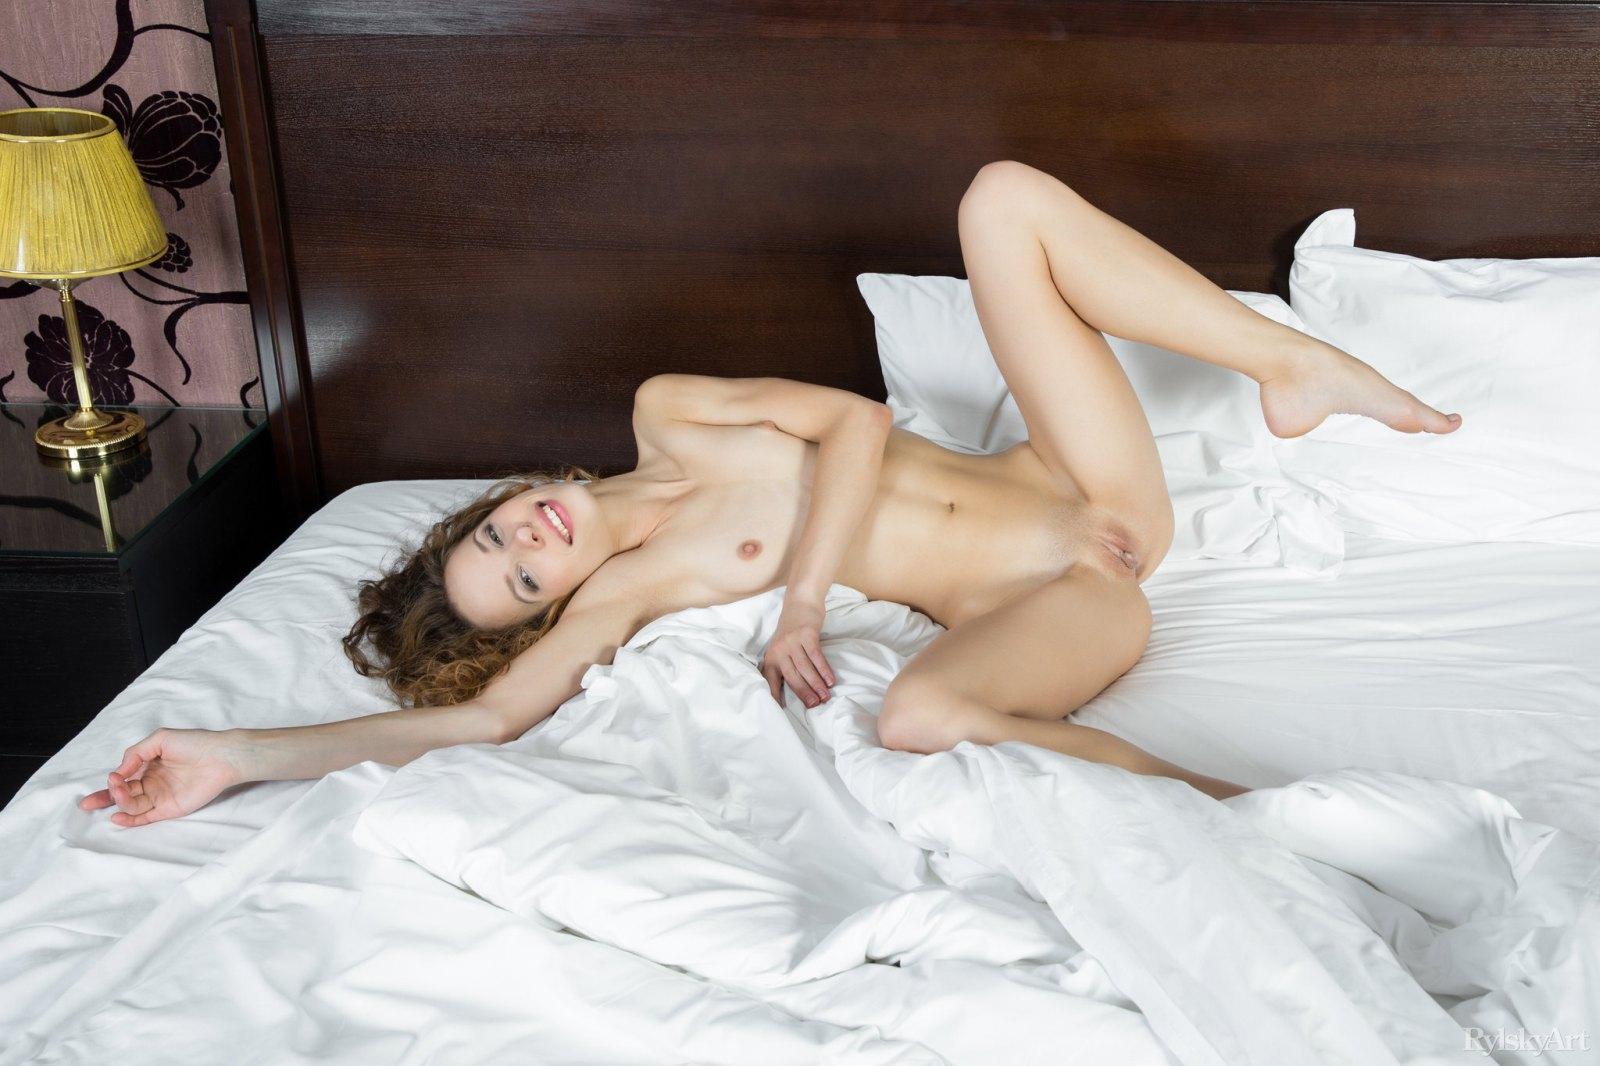 Gabrielle dennis underwear, interracial scene in justified tnaflix porn pics